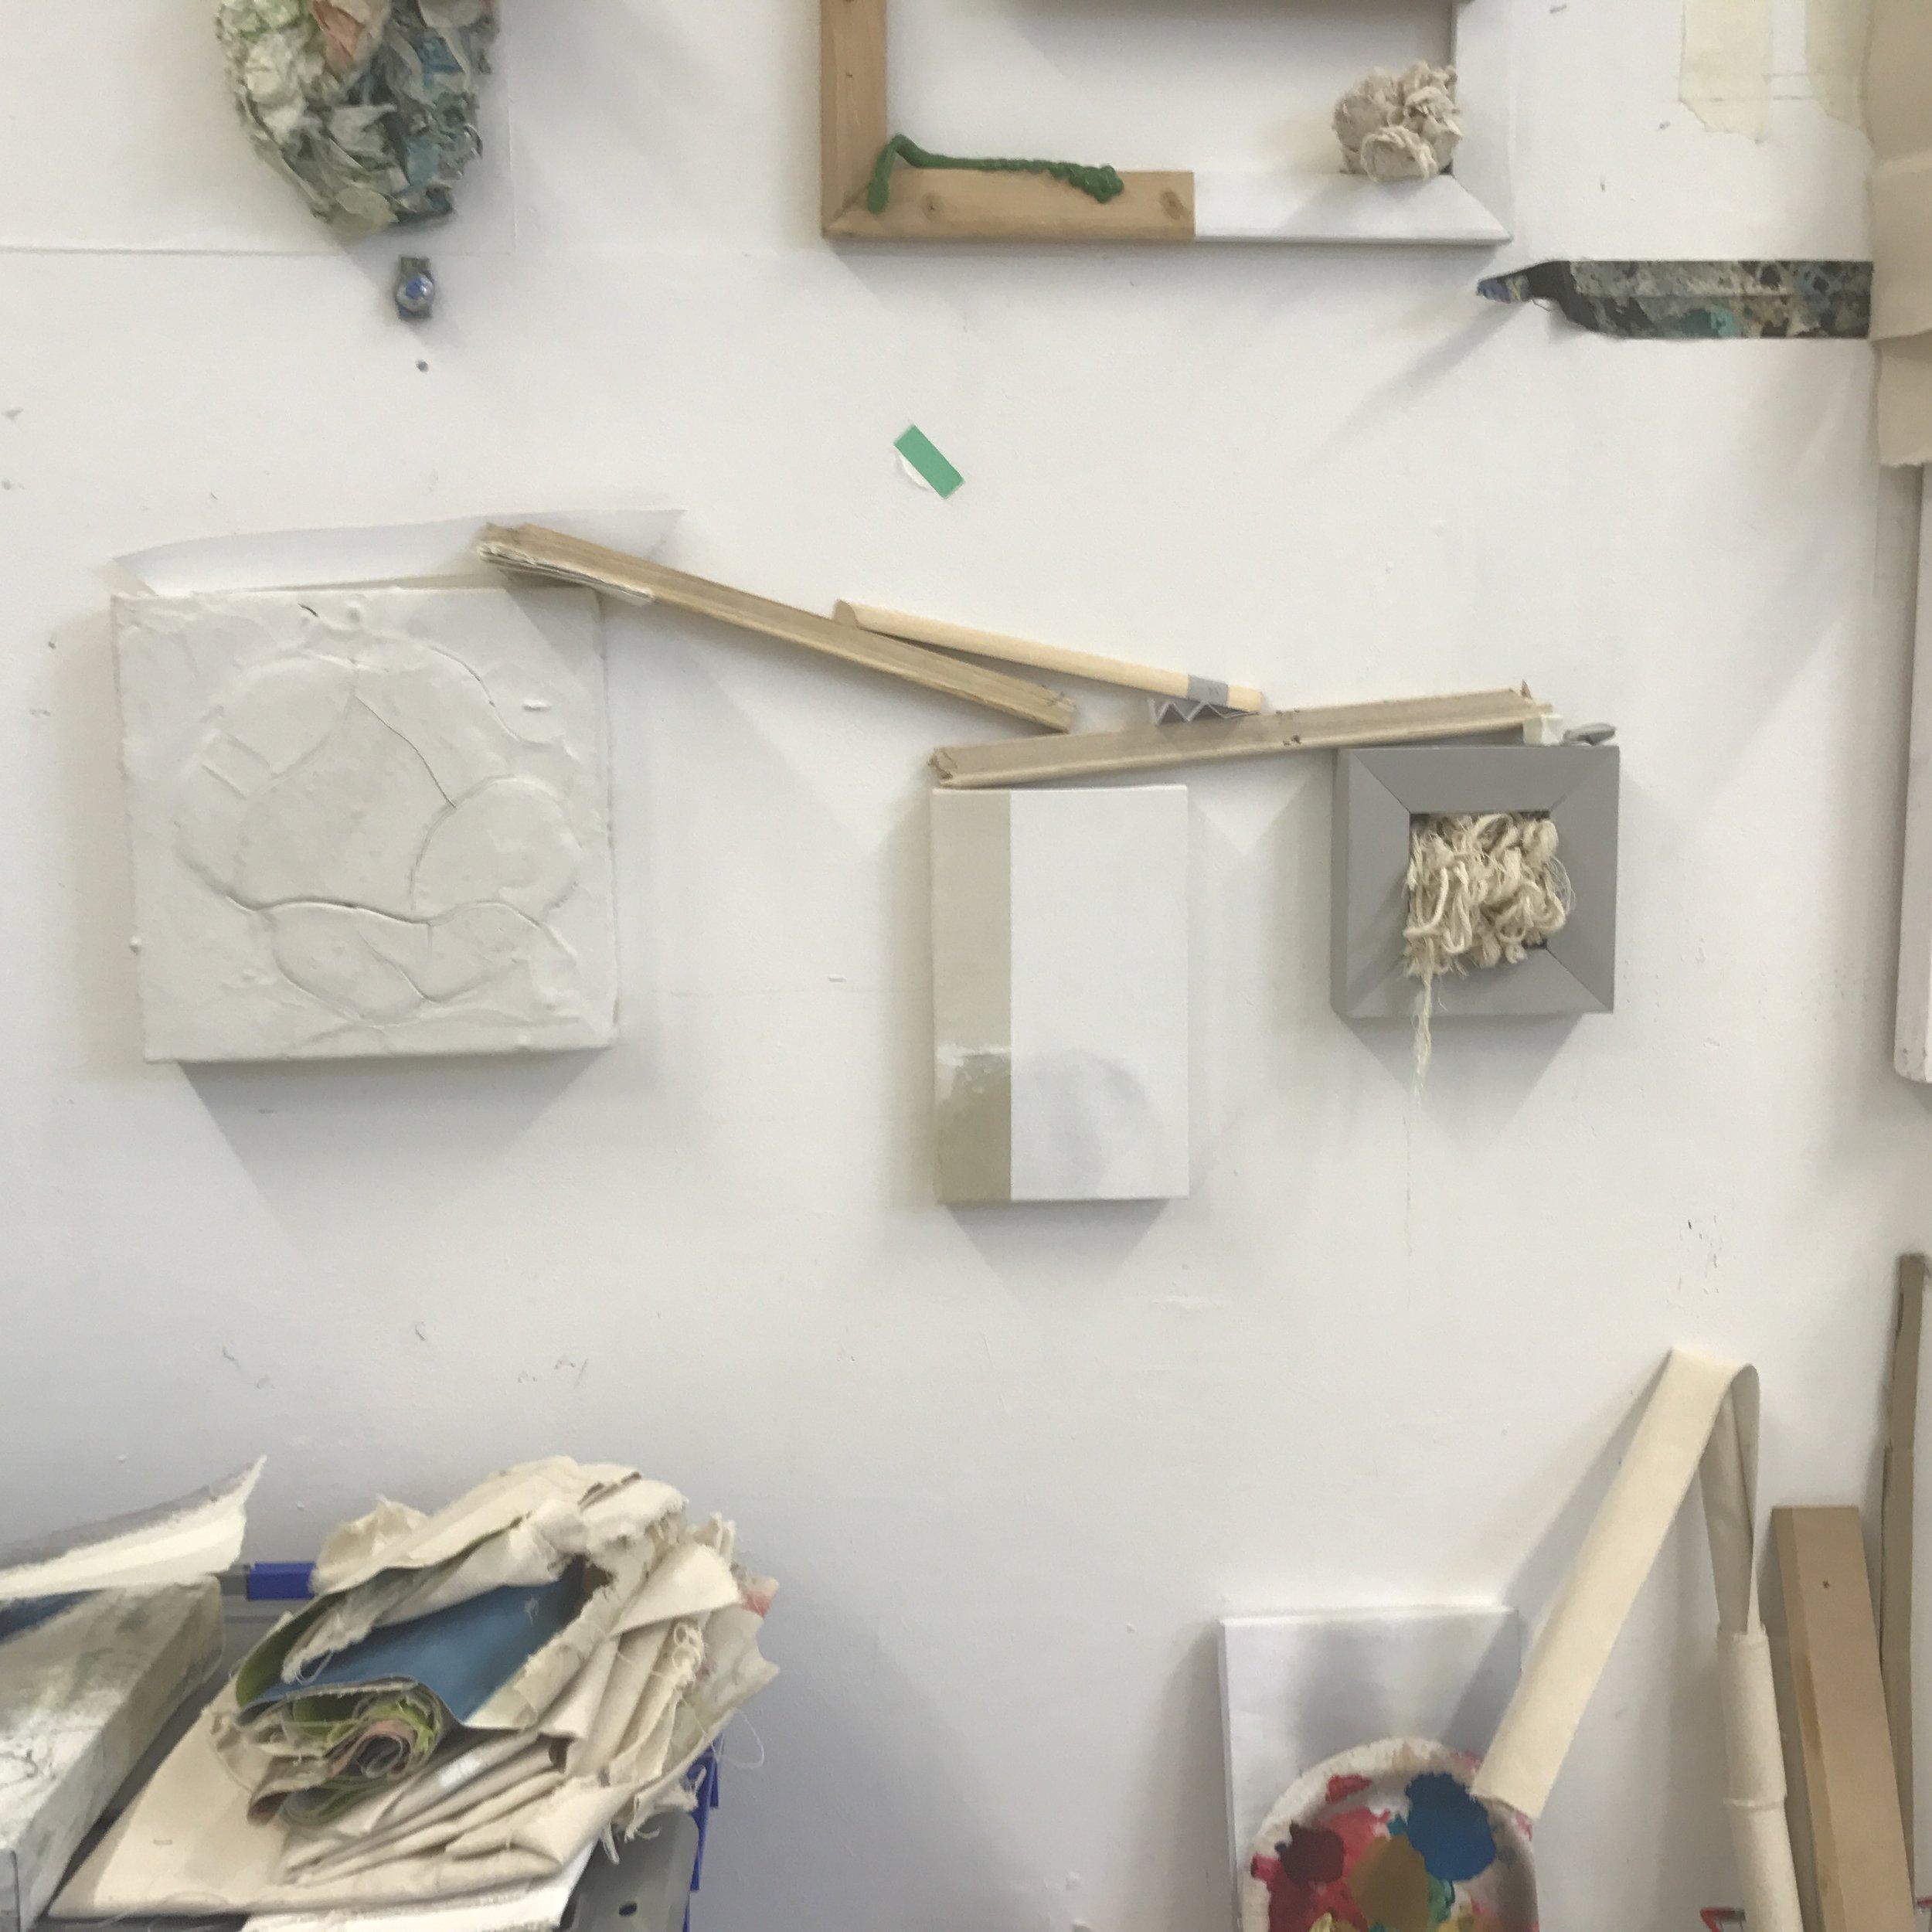 Ally McGinn (2017) [Studio documentation] Balance